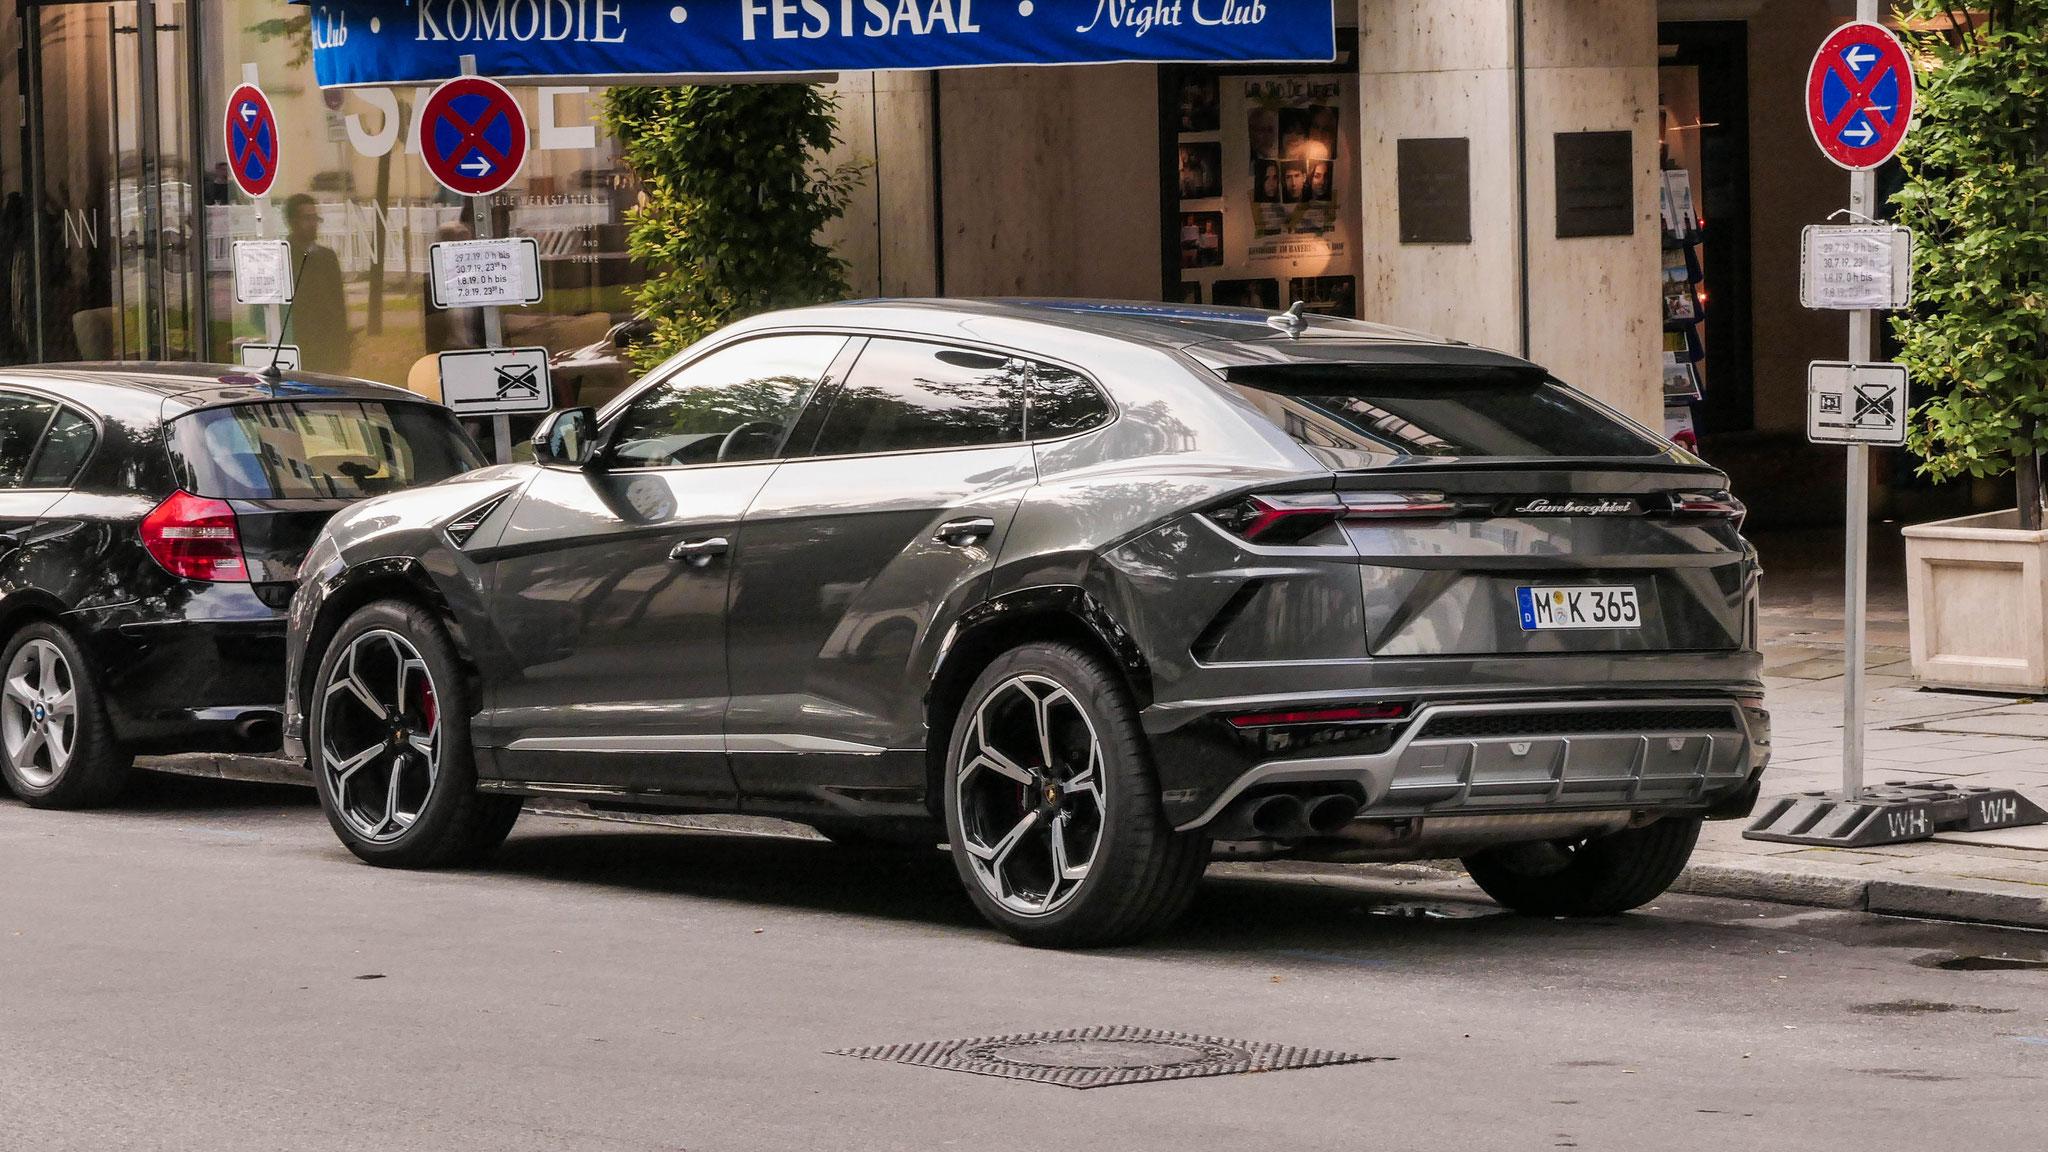 Lamborghini Urus - M-K-365